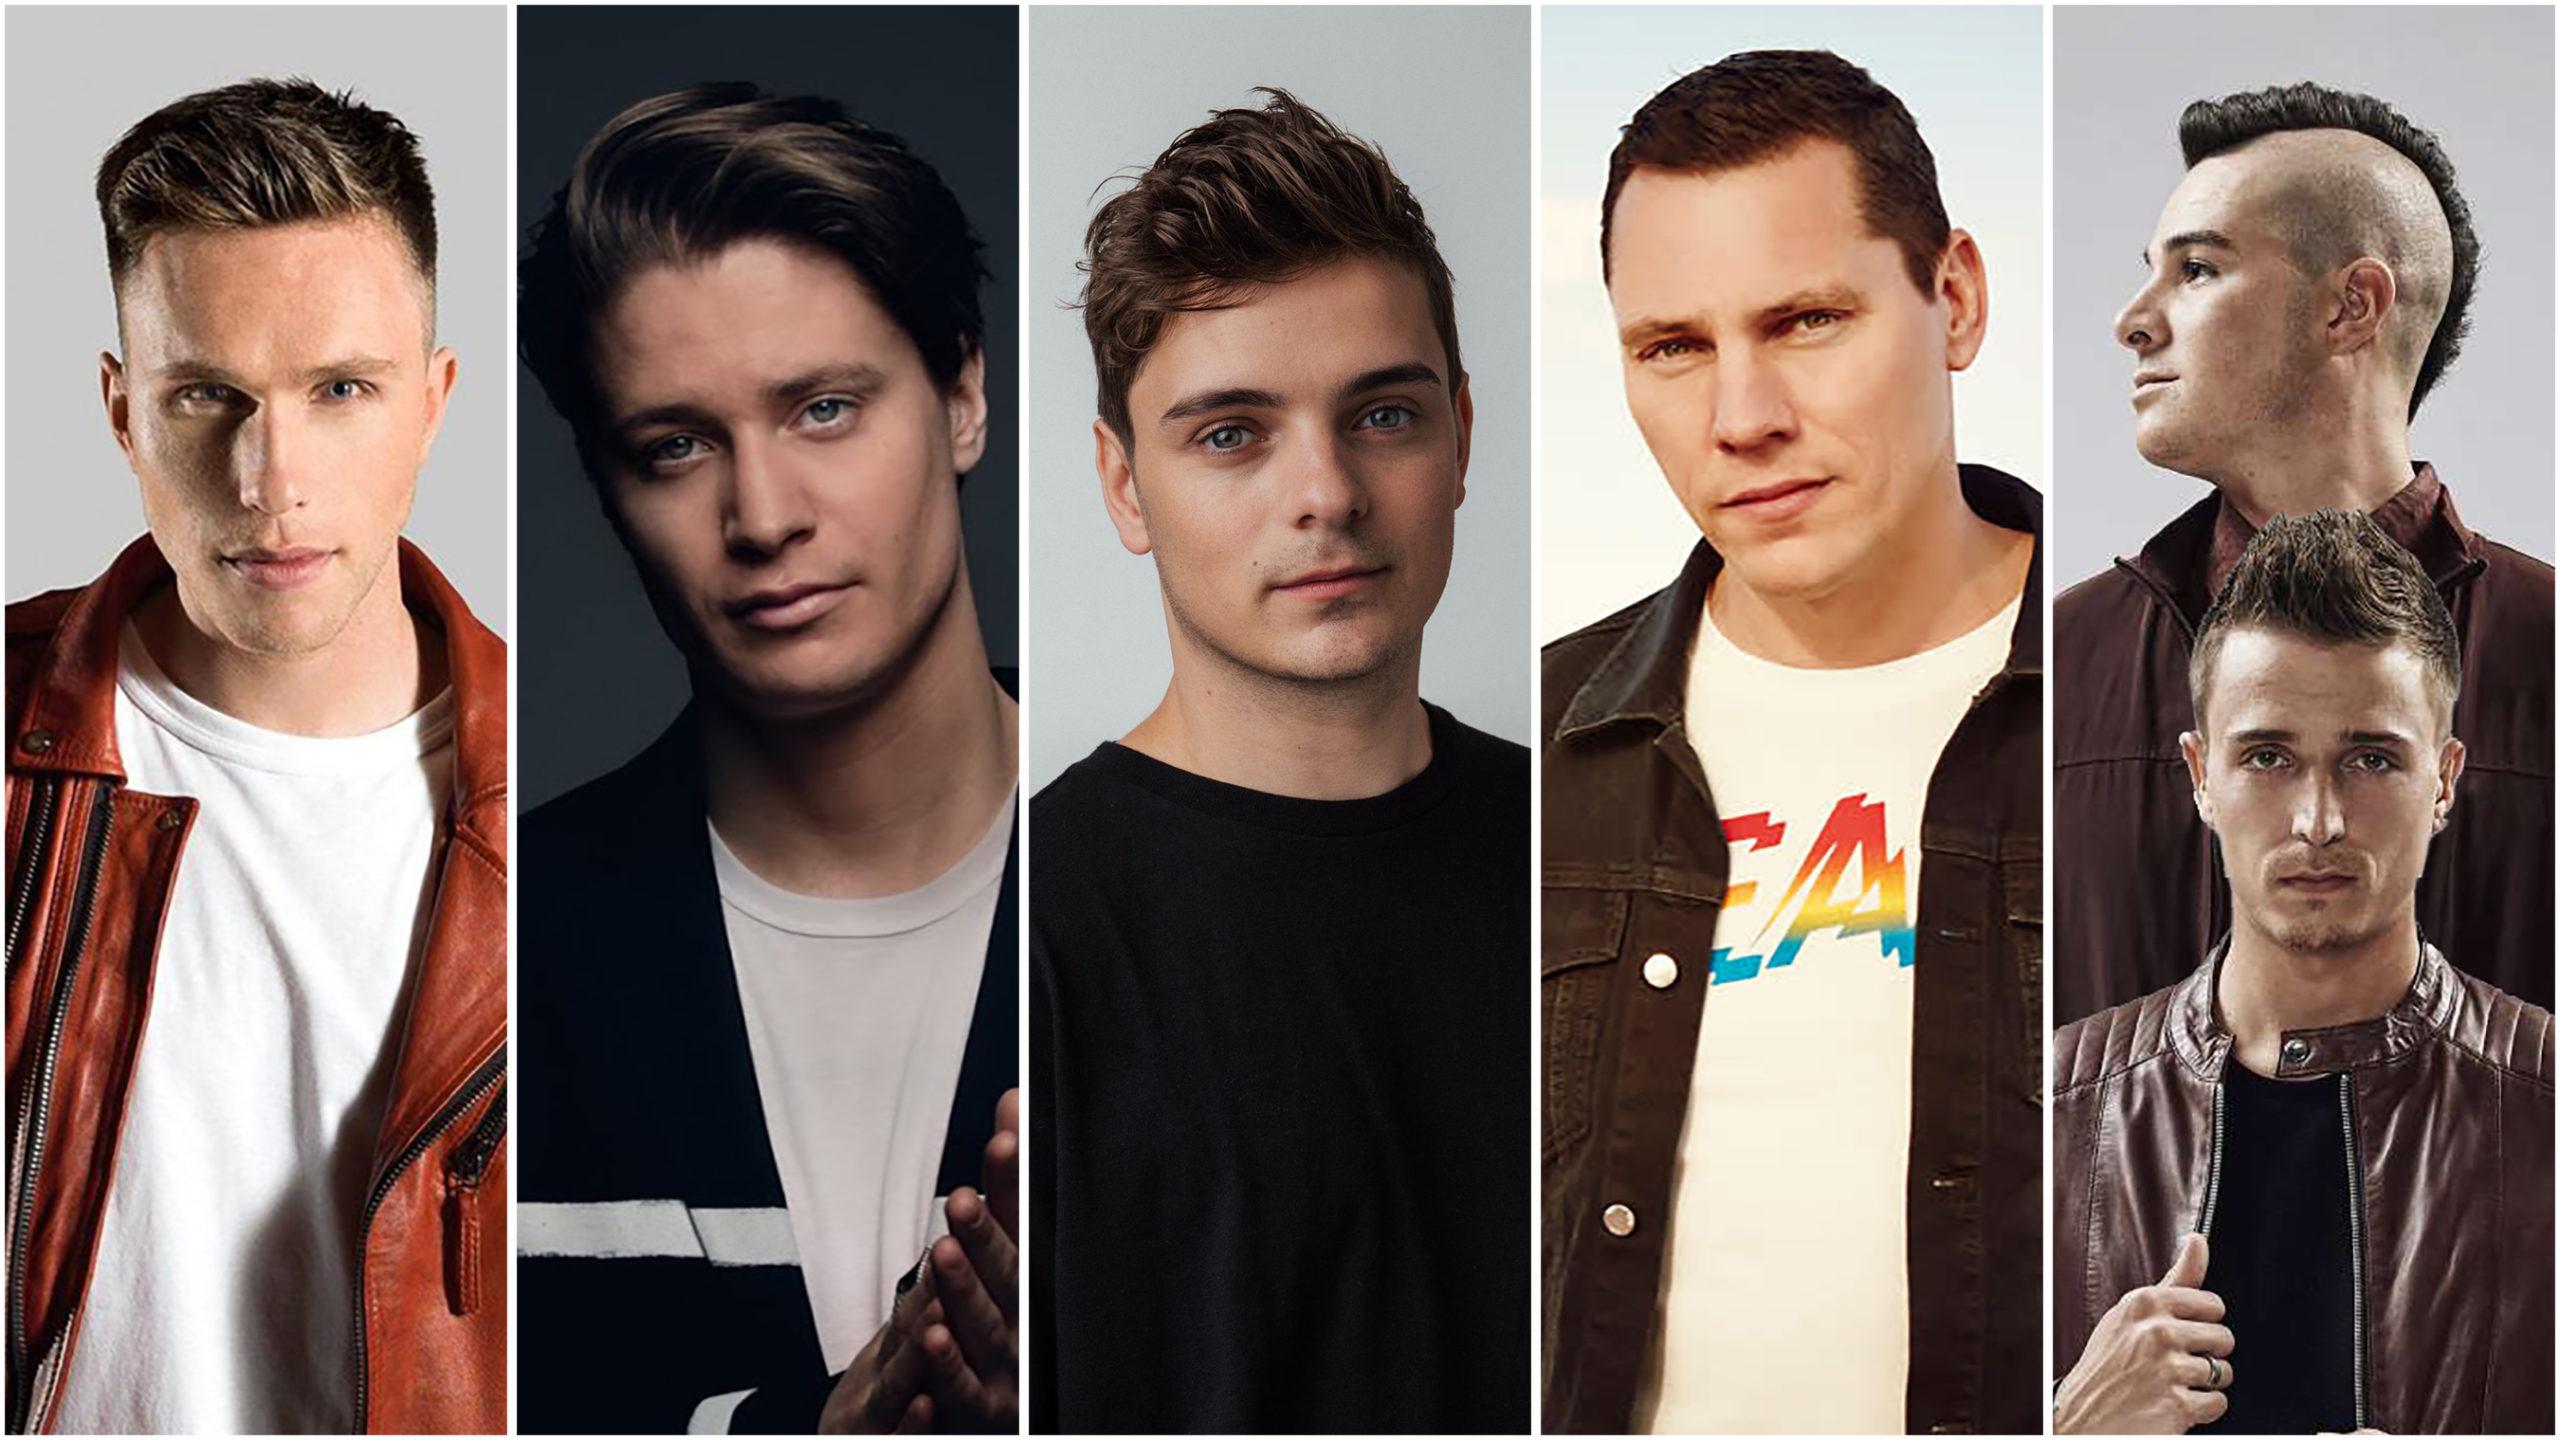 New EDM Friday: Martin Garrix, Tiesto, Blasterjaxx, Kygo, Nicky Romero, And  More! |